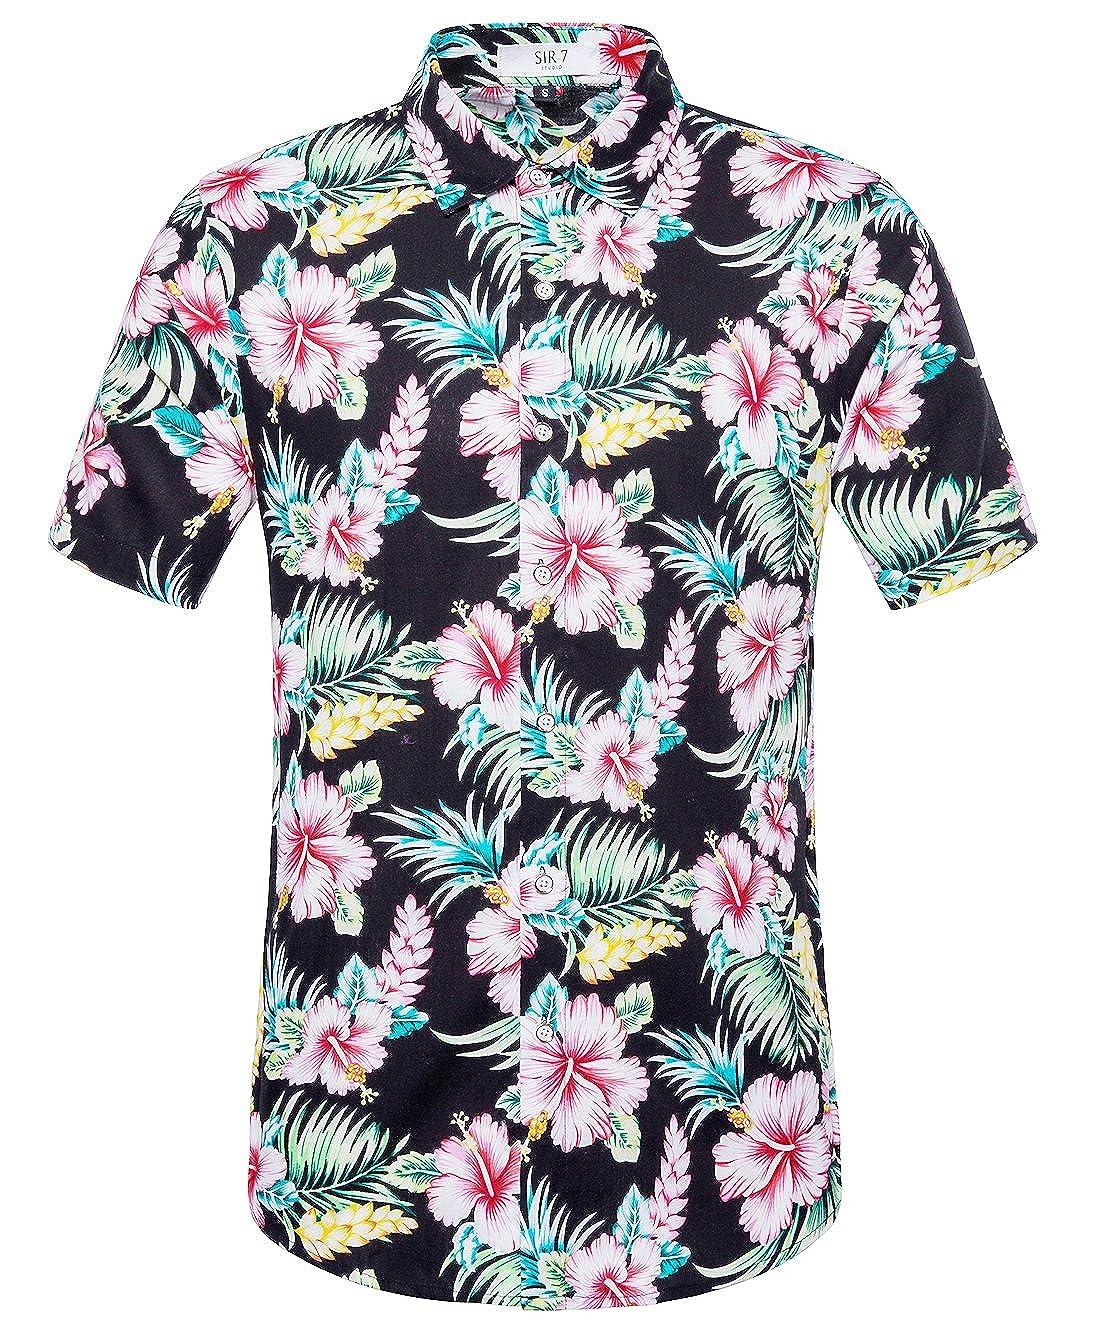 SIR7 Men's Hawaiian Flower Print Casual Button Down Short Sleeve Shirt HCS-C51-1